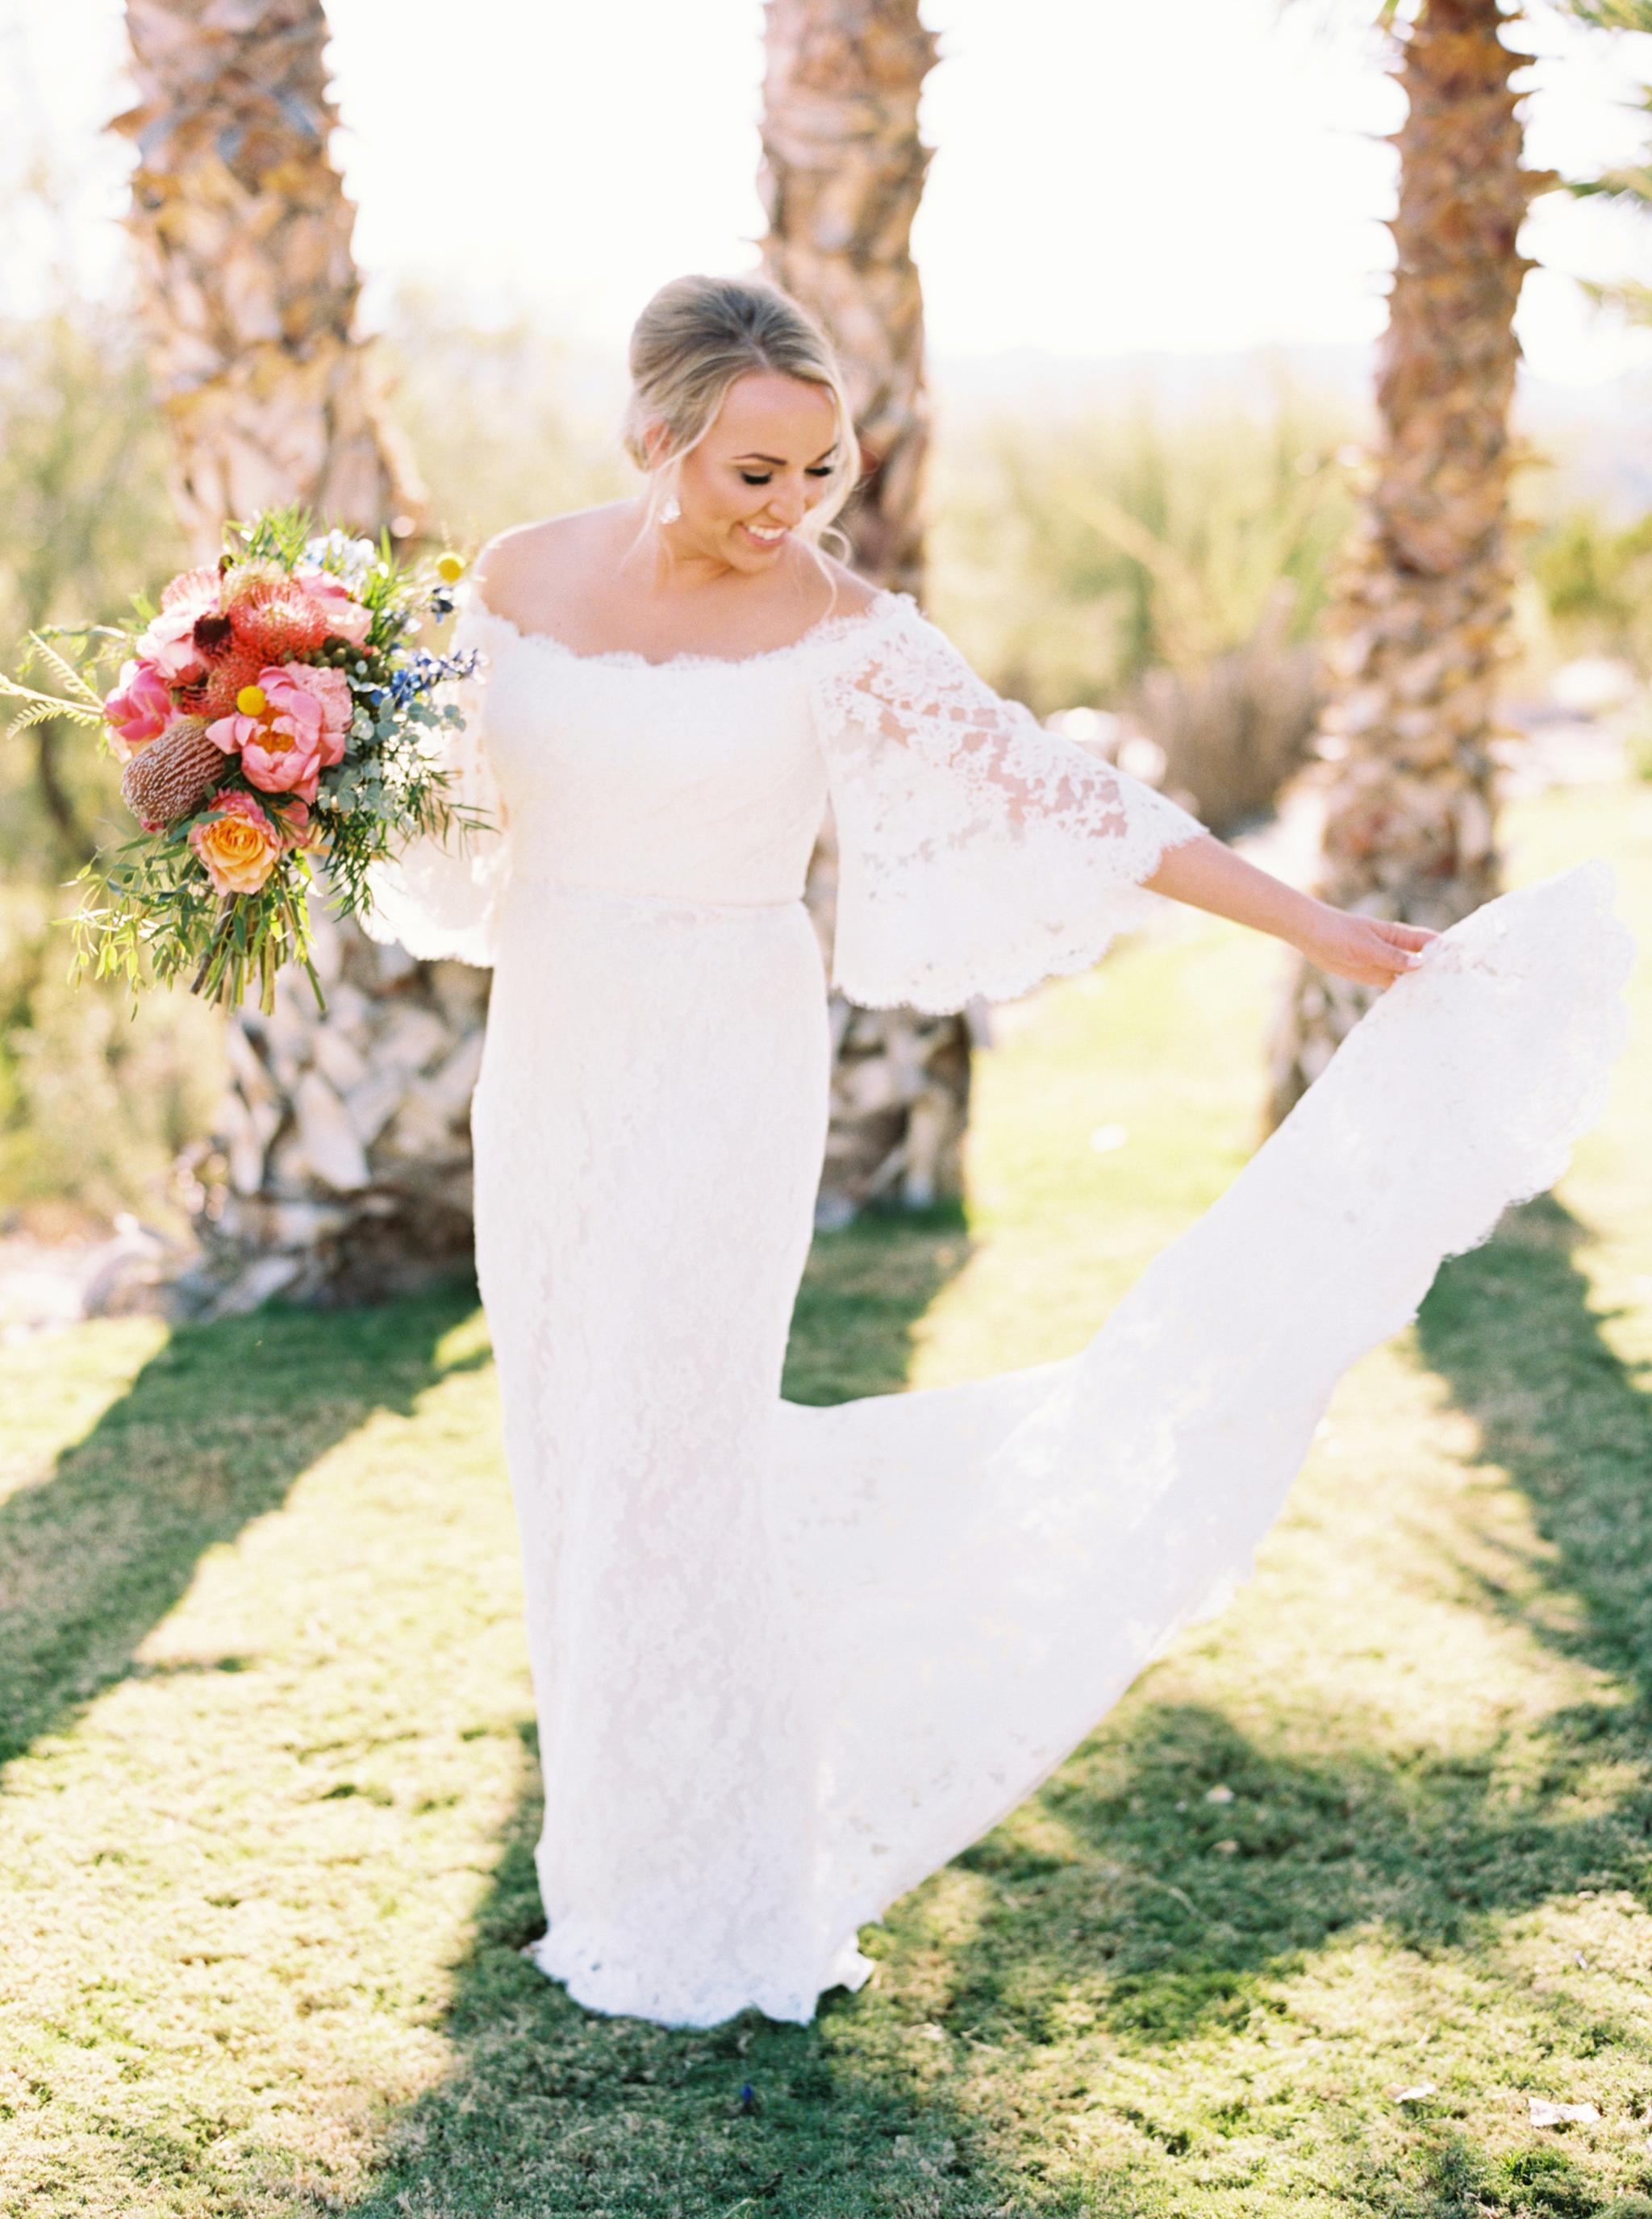 Charleston Wedding Photographer, Lajitas Wedding Photographer, North Carolina Wedding Photographer, Nashville Wedding Photographer, Alabama Film Photographer, Georgia Wedding Photographer